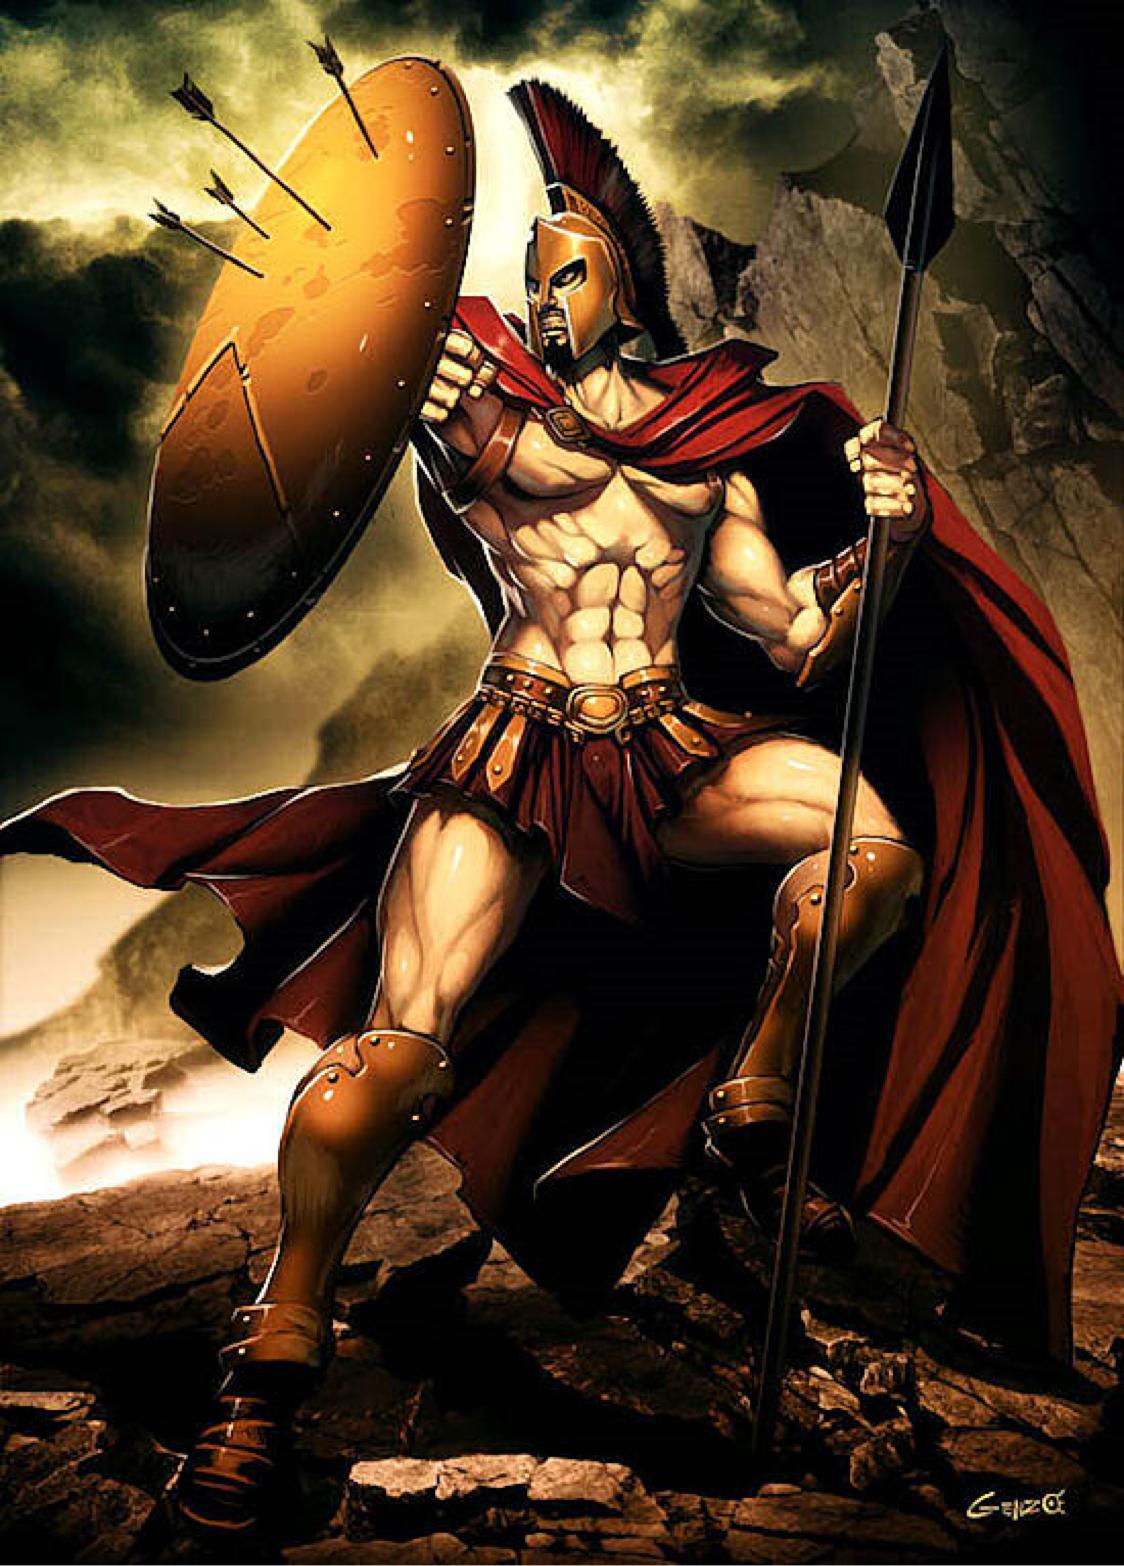 馬爾斯 Mars Roman God of war